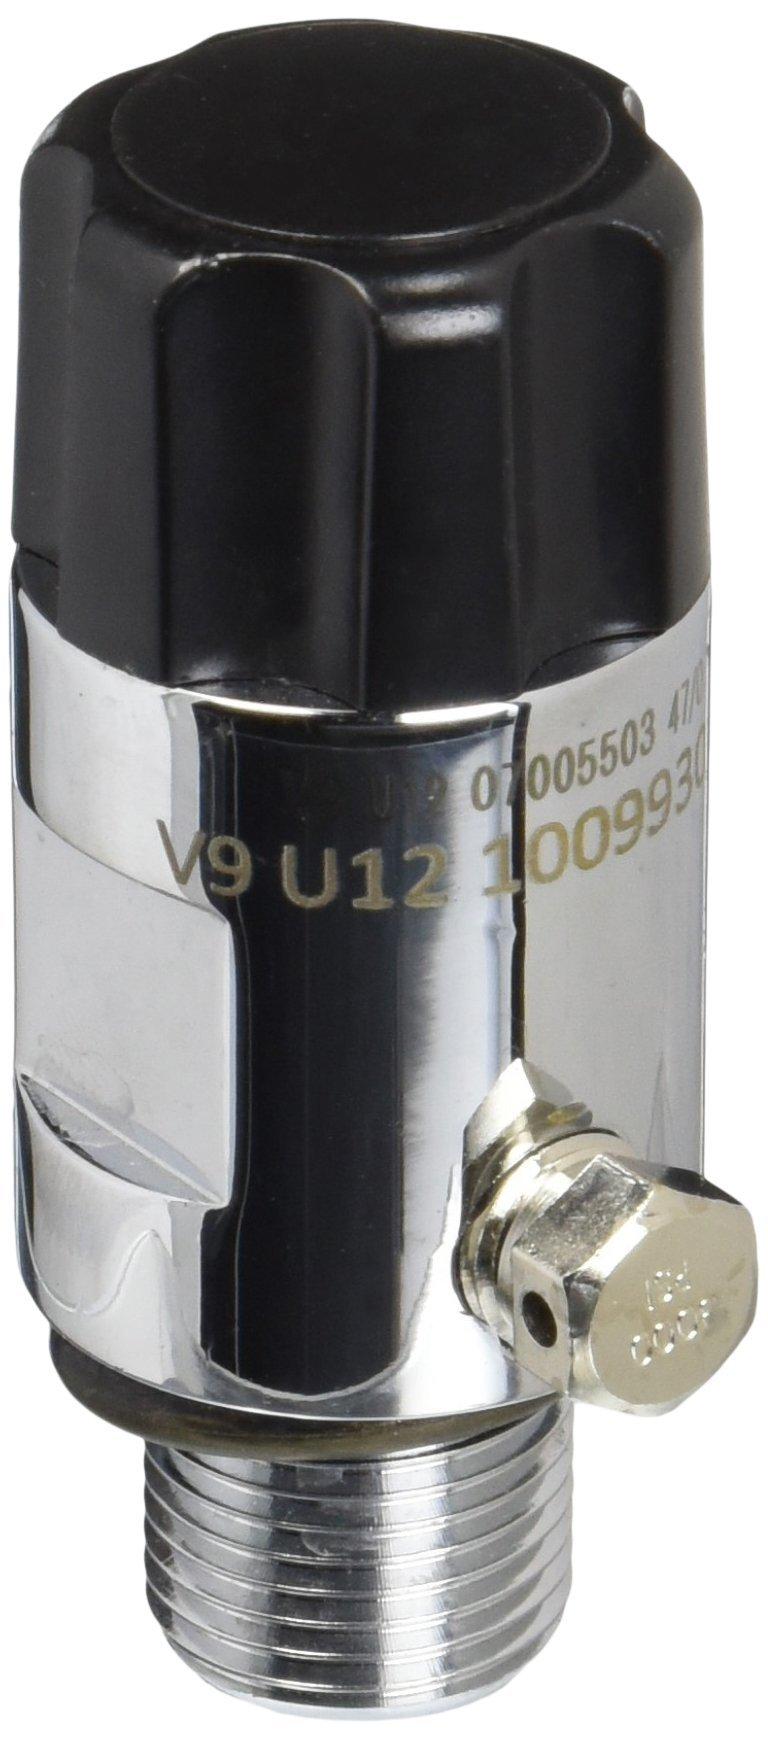 NOS 16145 3/4'' Small Hi-Flo Nitrous Bottle Valve